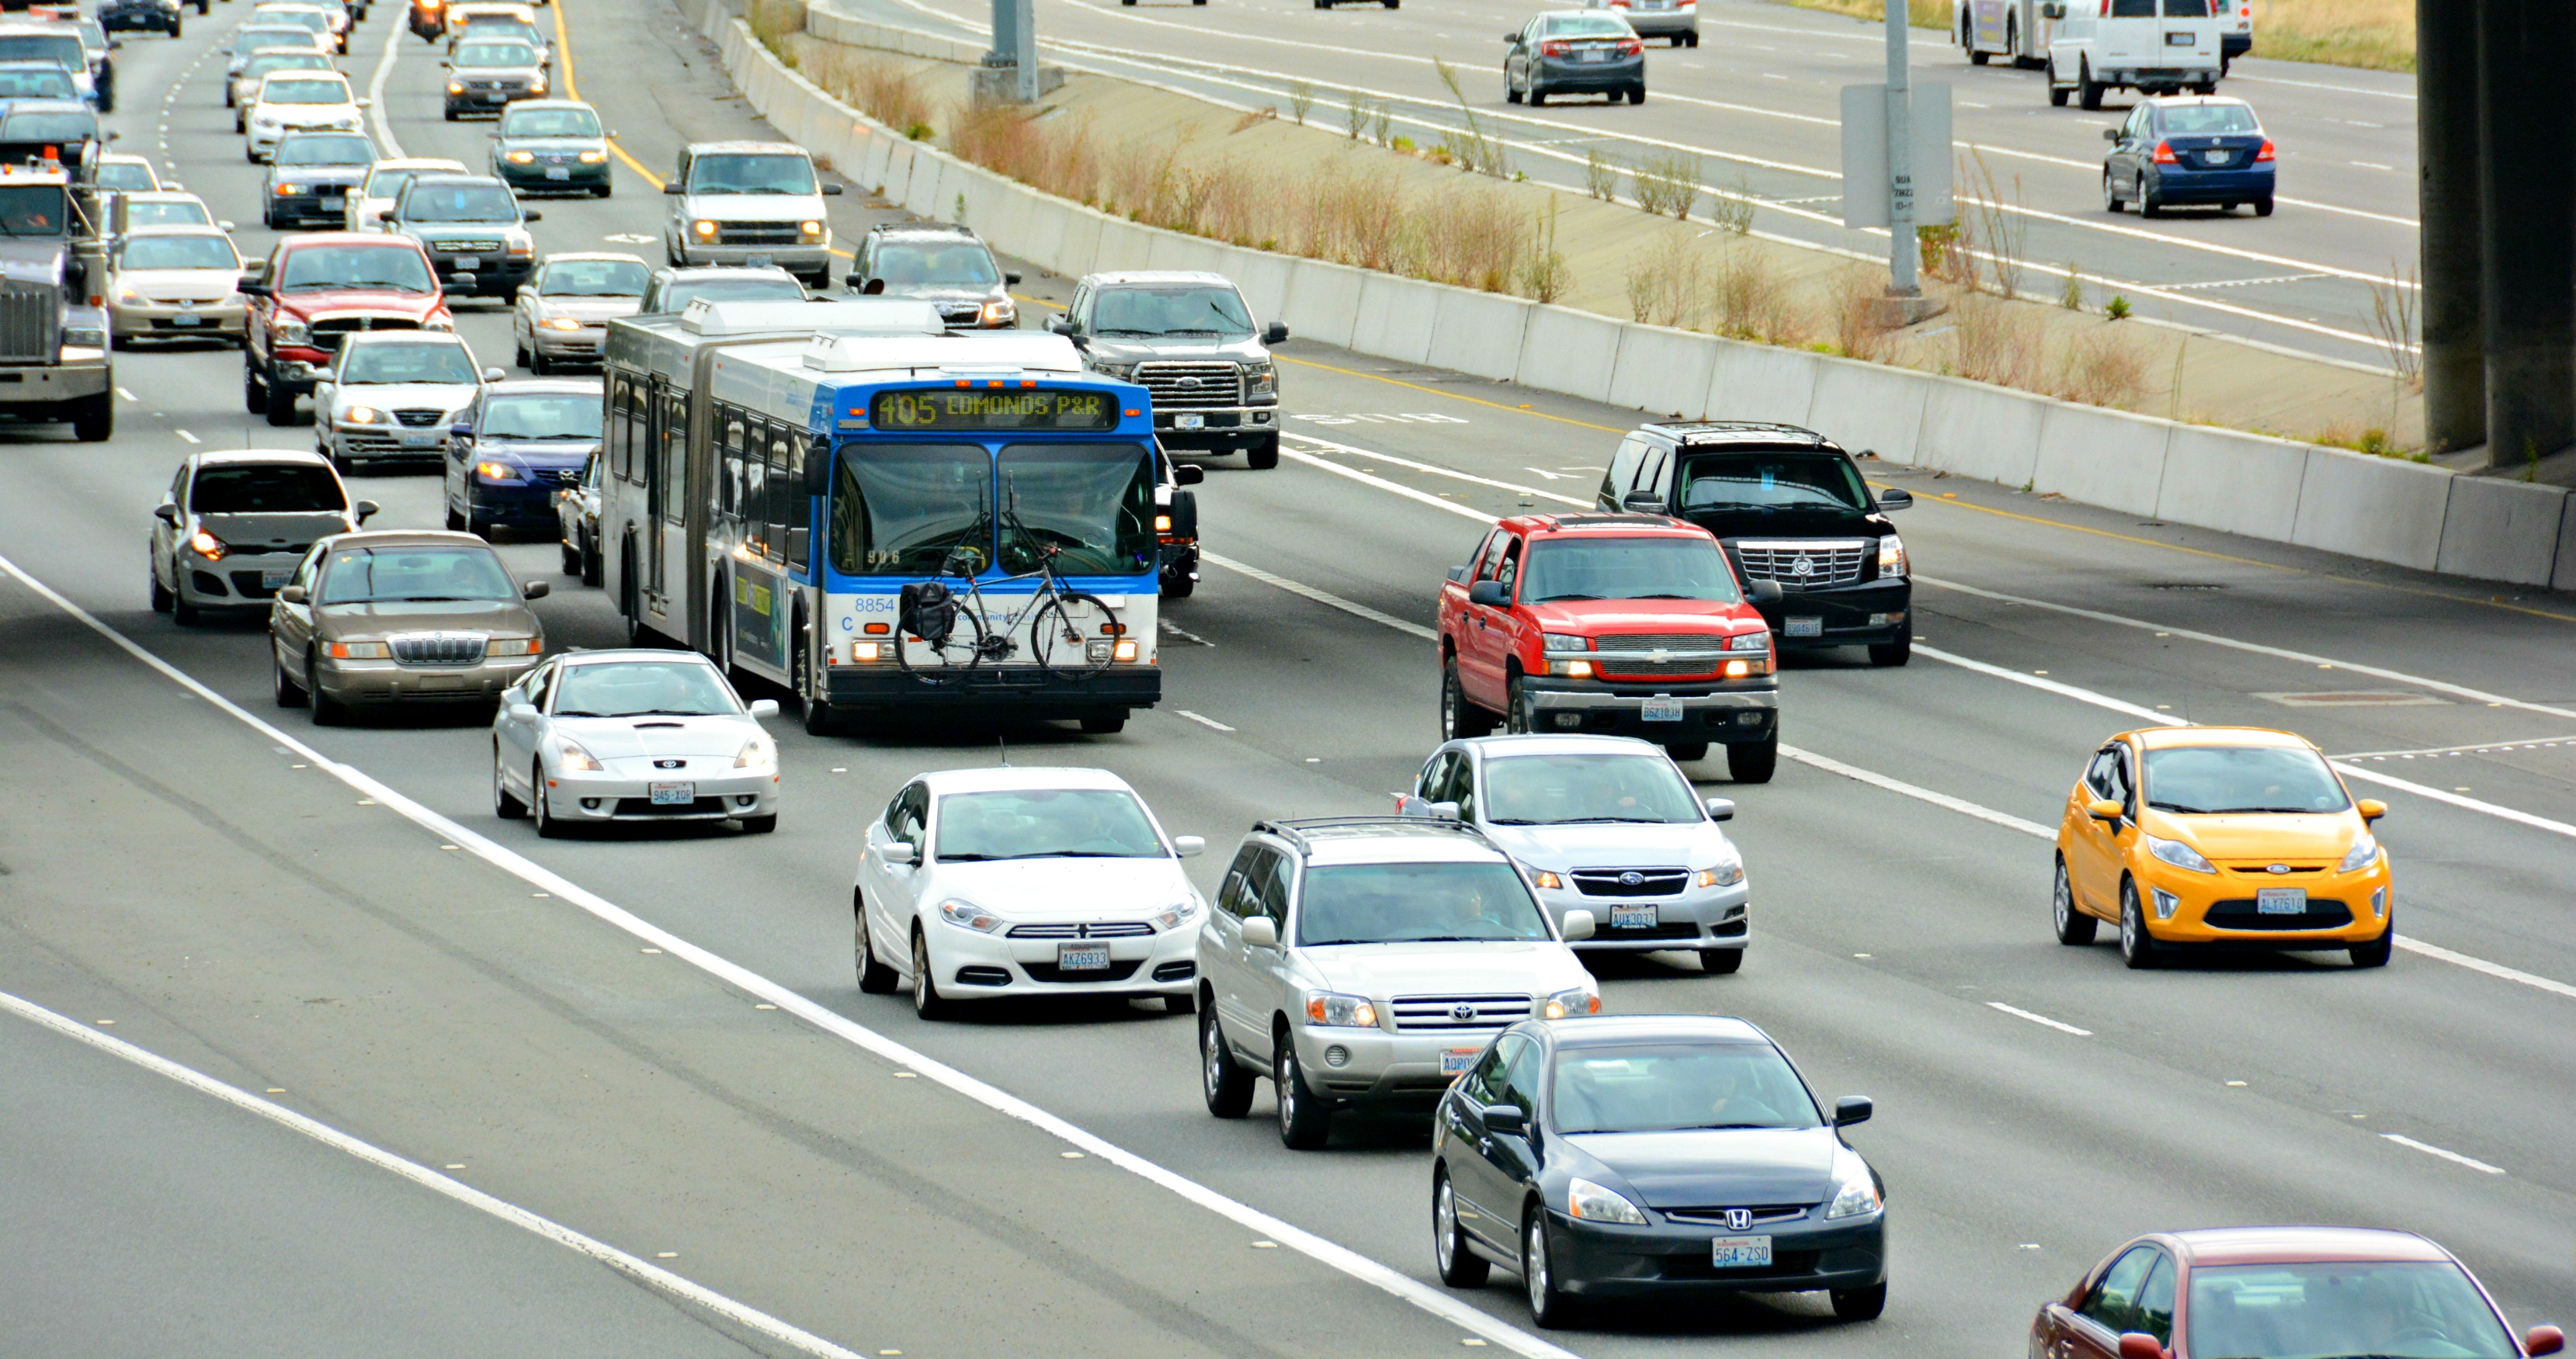 Community Transit Board approves new bus service plan - My Edmonds News